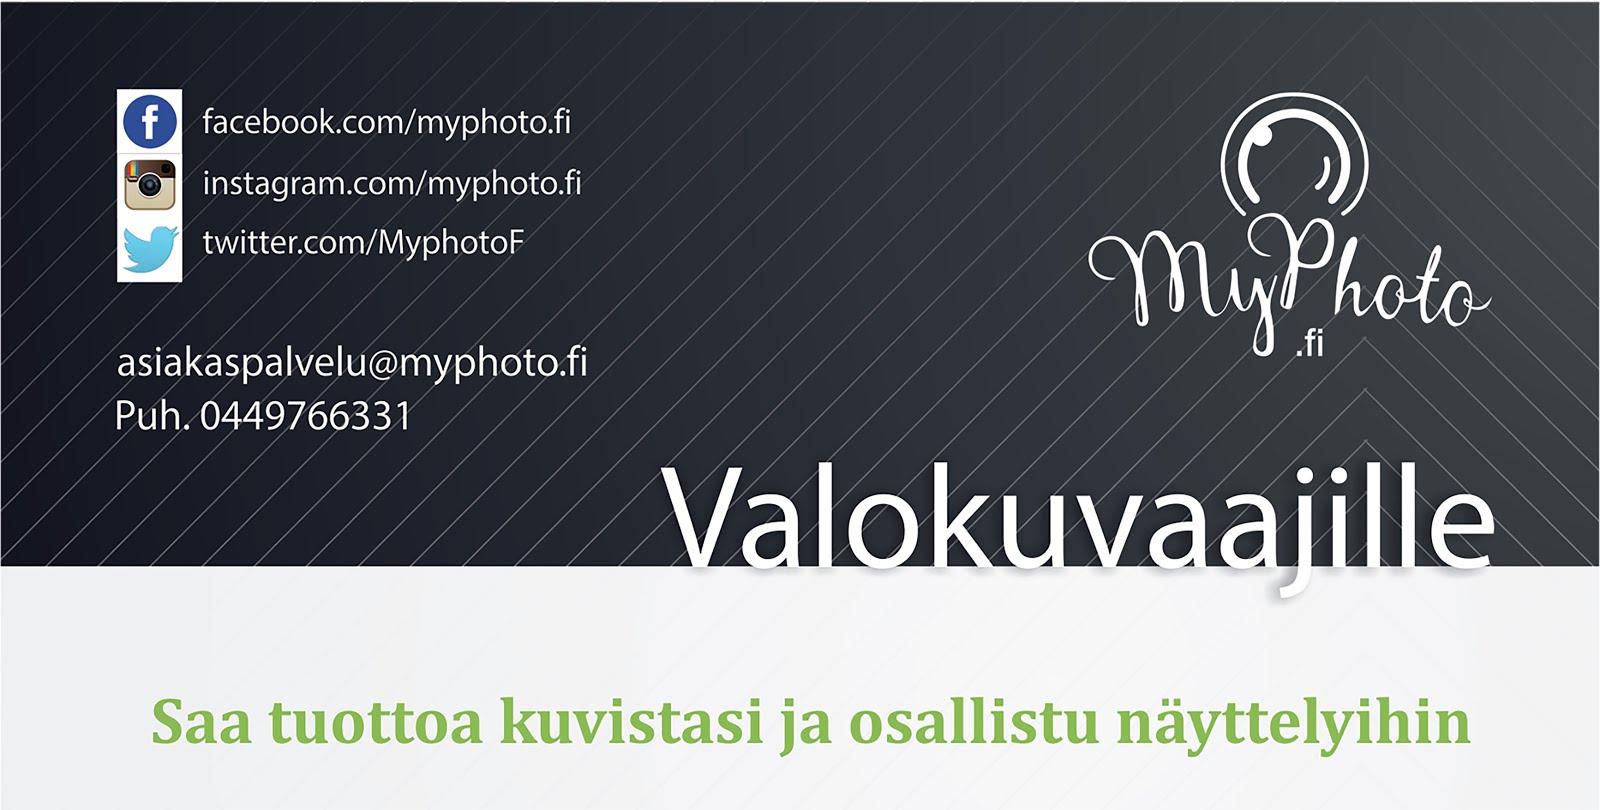 Myphoto.fi